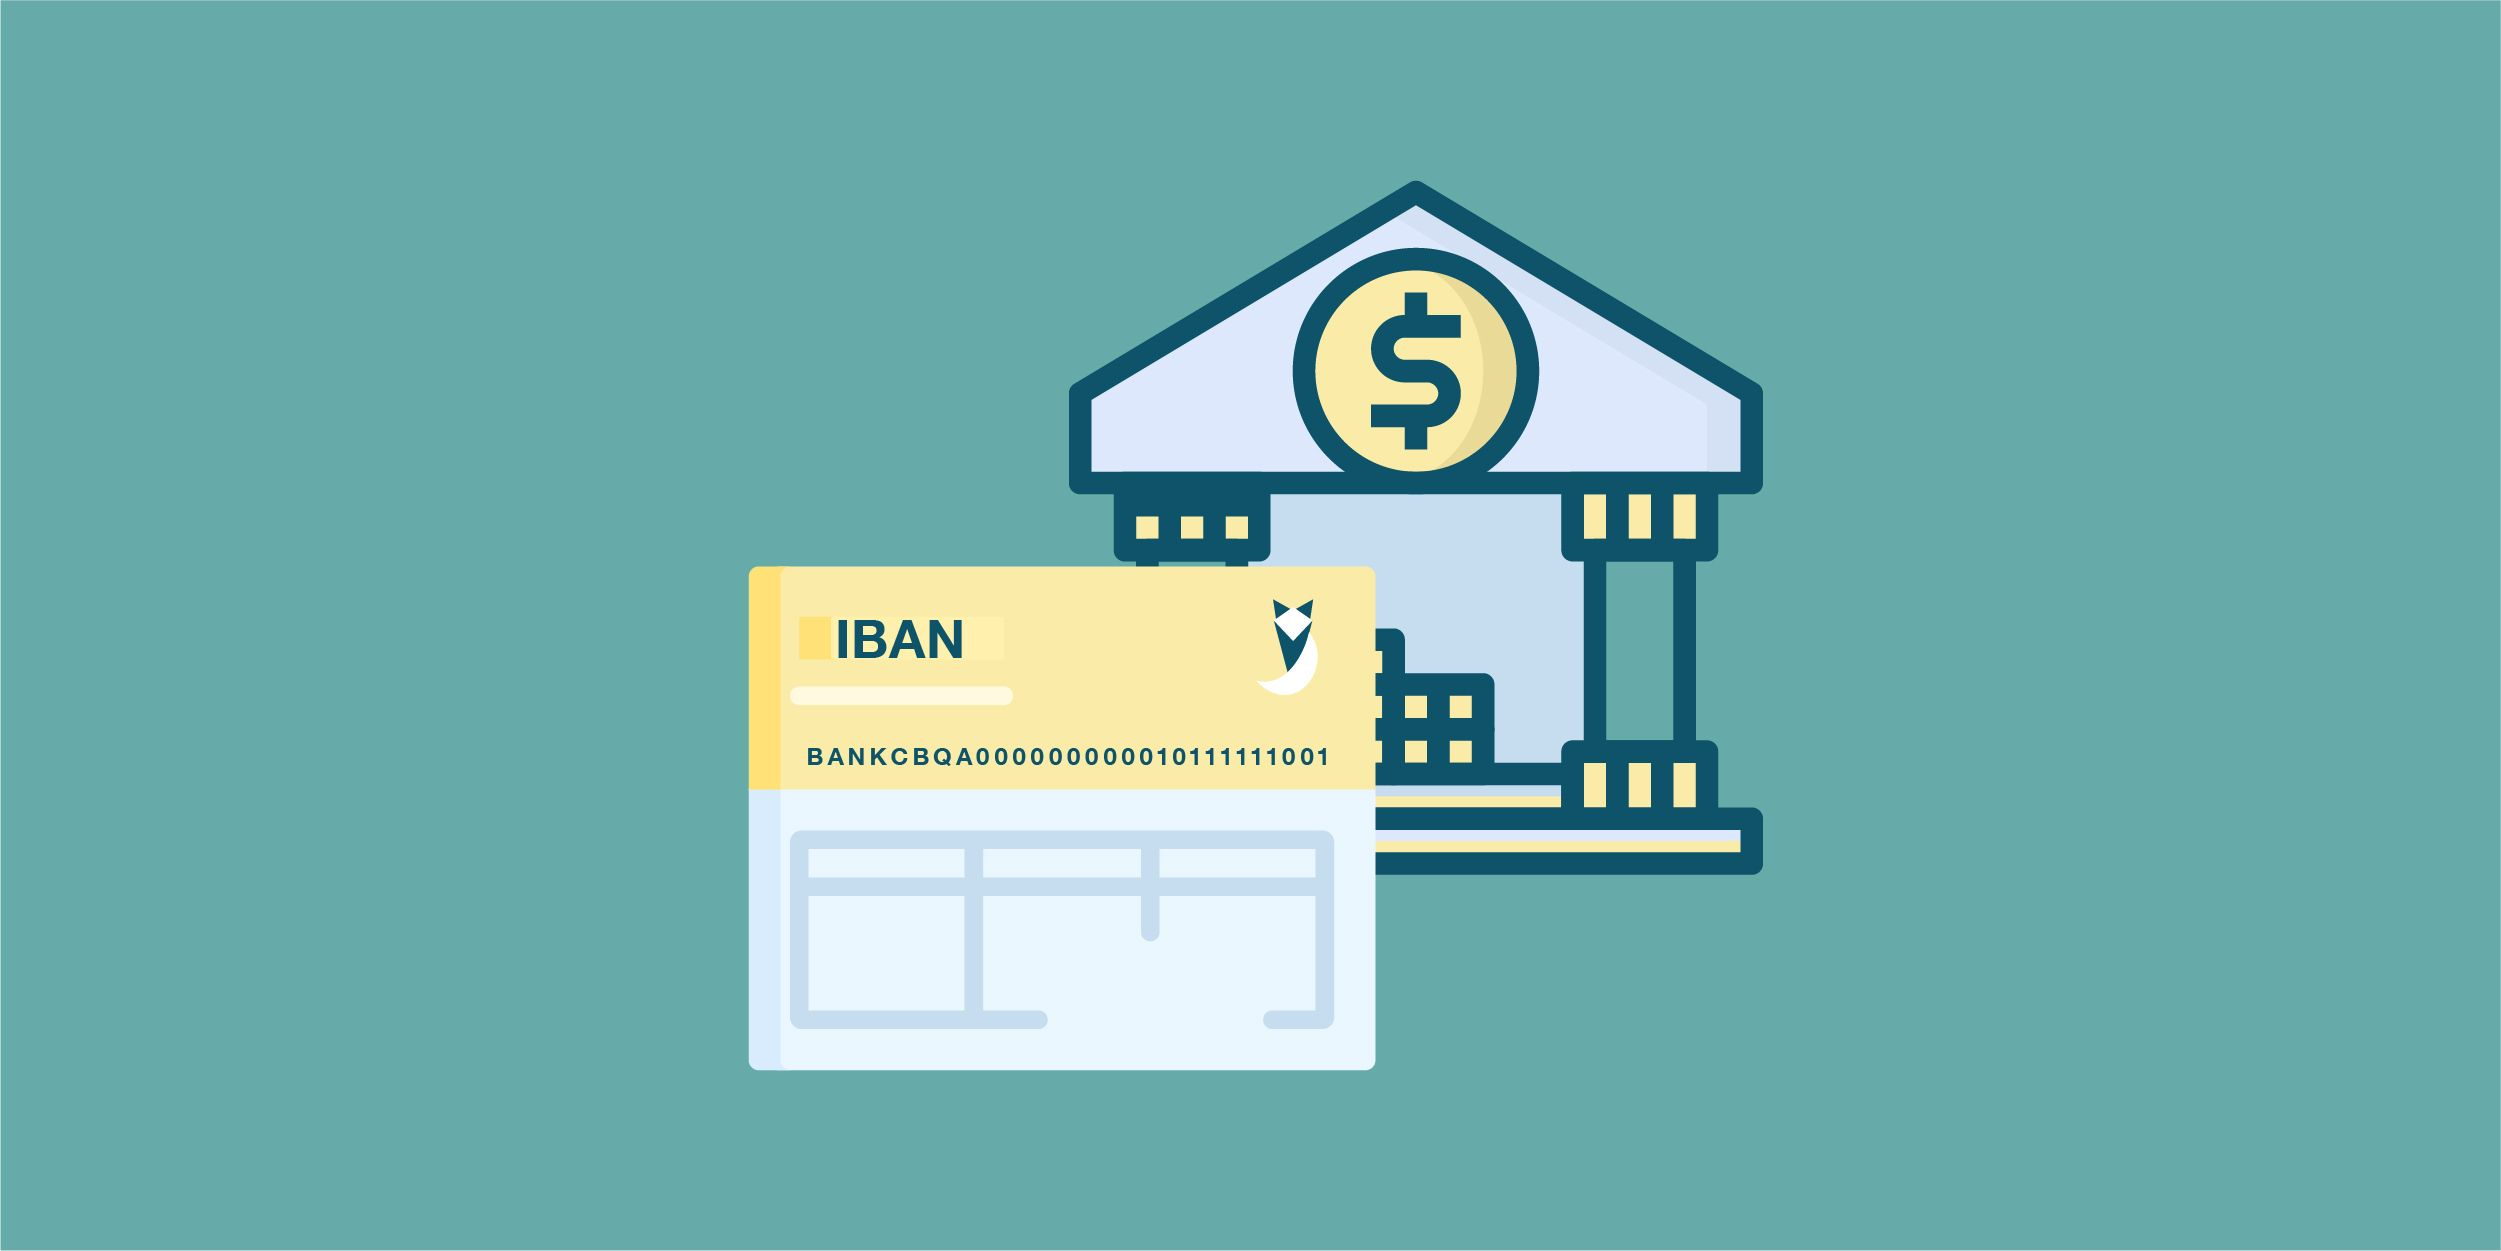 ايه هو IBAN/ رقم الحساب المصرفي الدولي؟